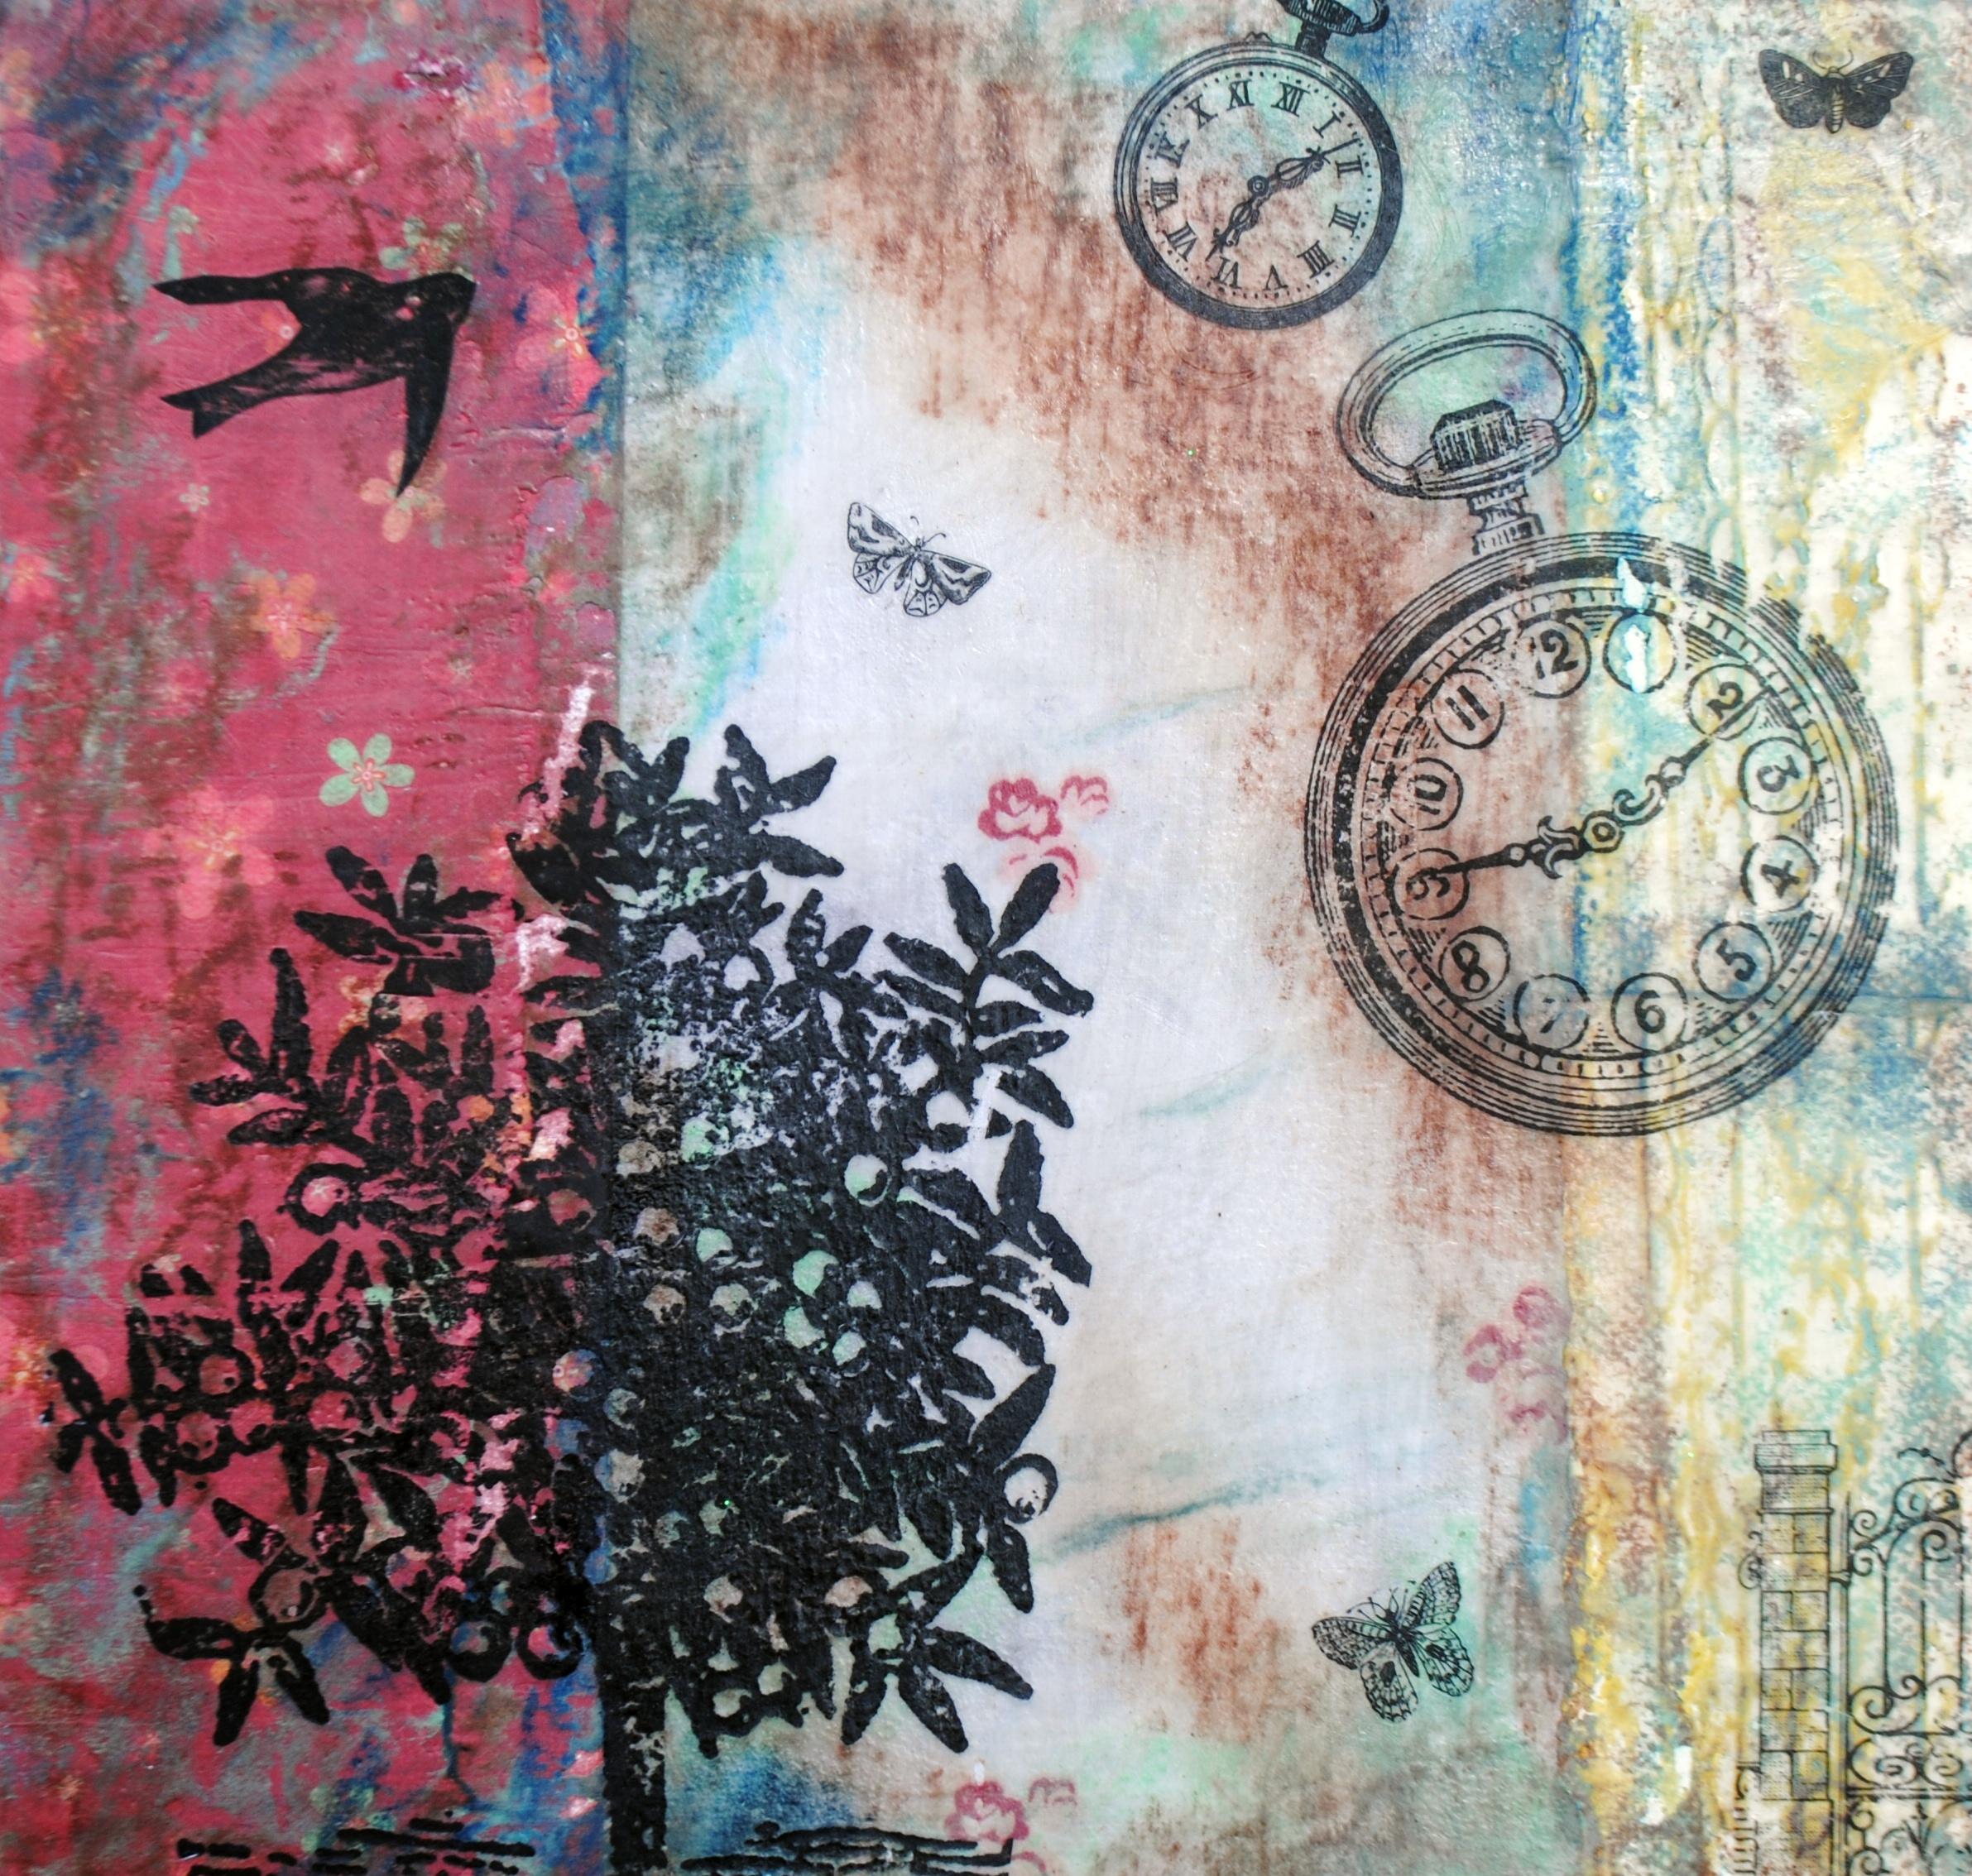 Encaustic on Wood, 12 x12, Tempis Fugit, Jennie Schut